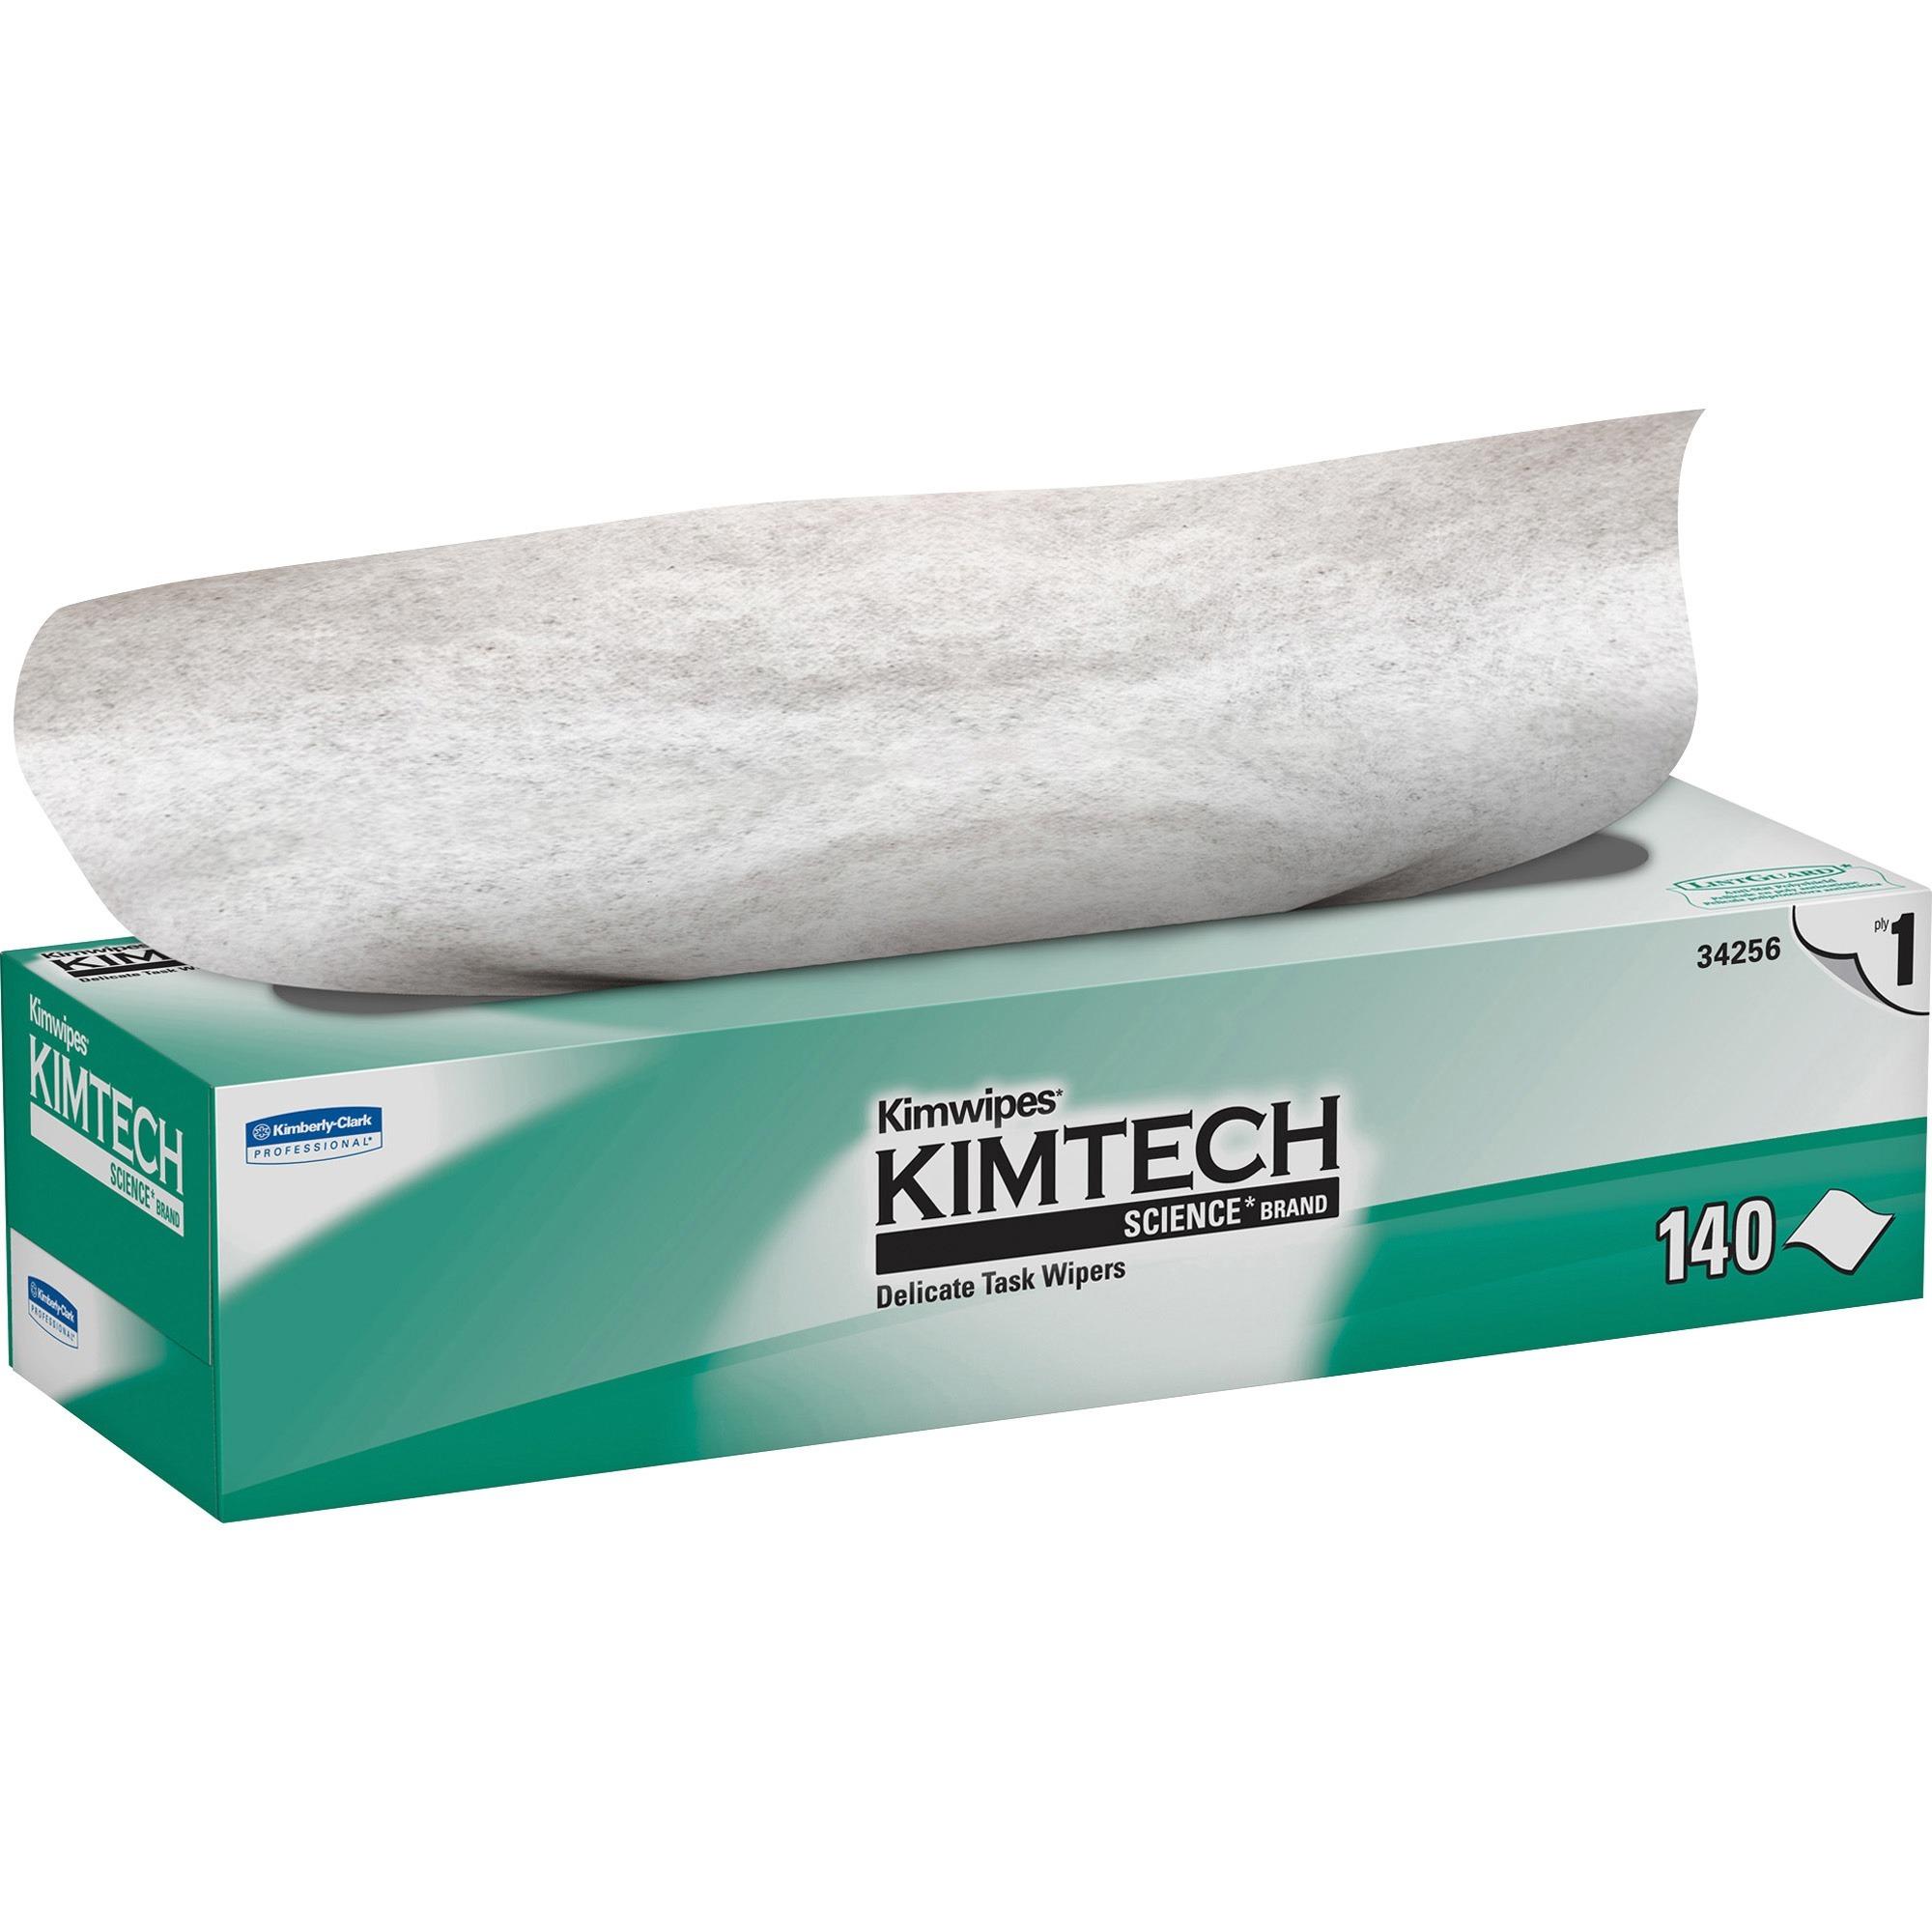 Kimberly-Clark, KCC34256, KimWipes Task Wipers, 140 / Box